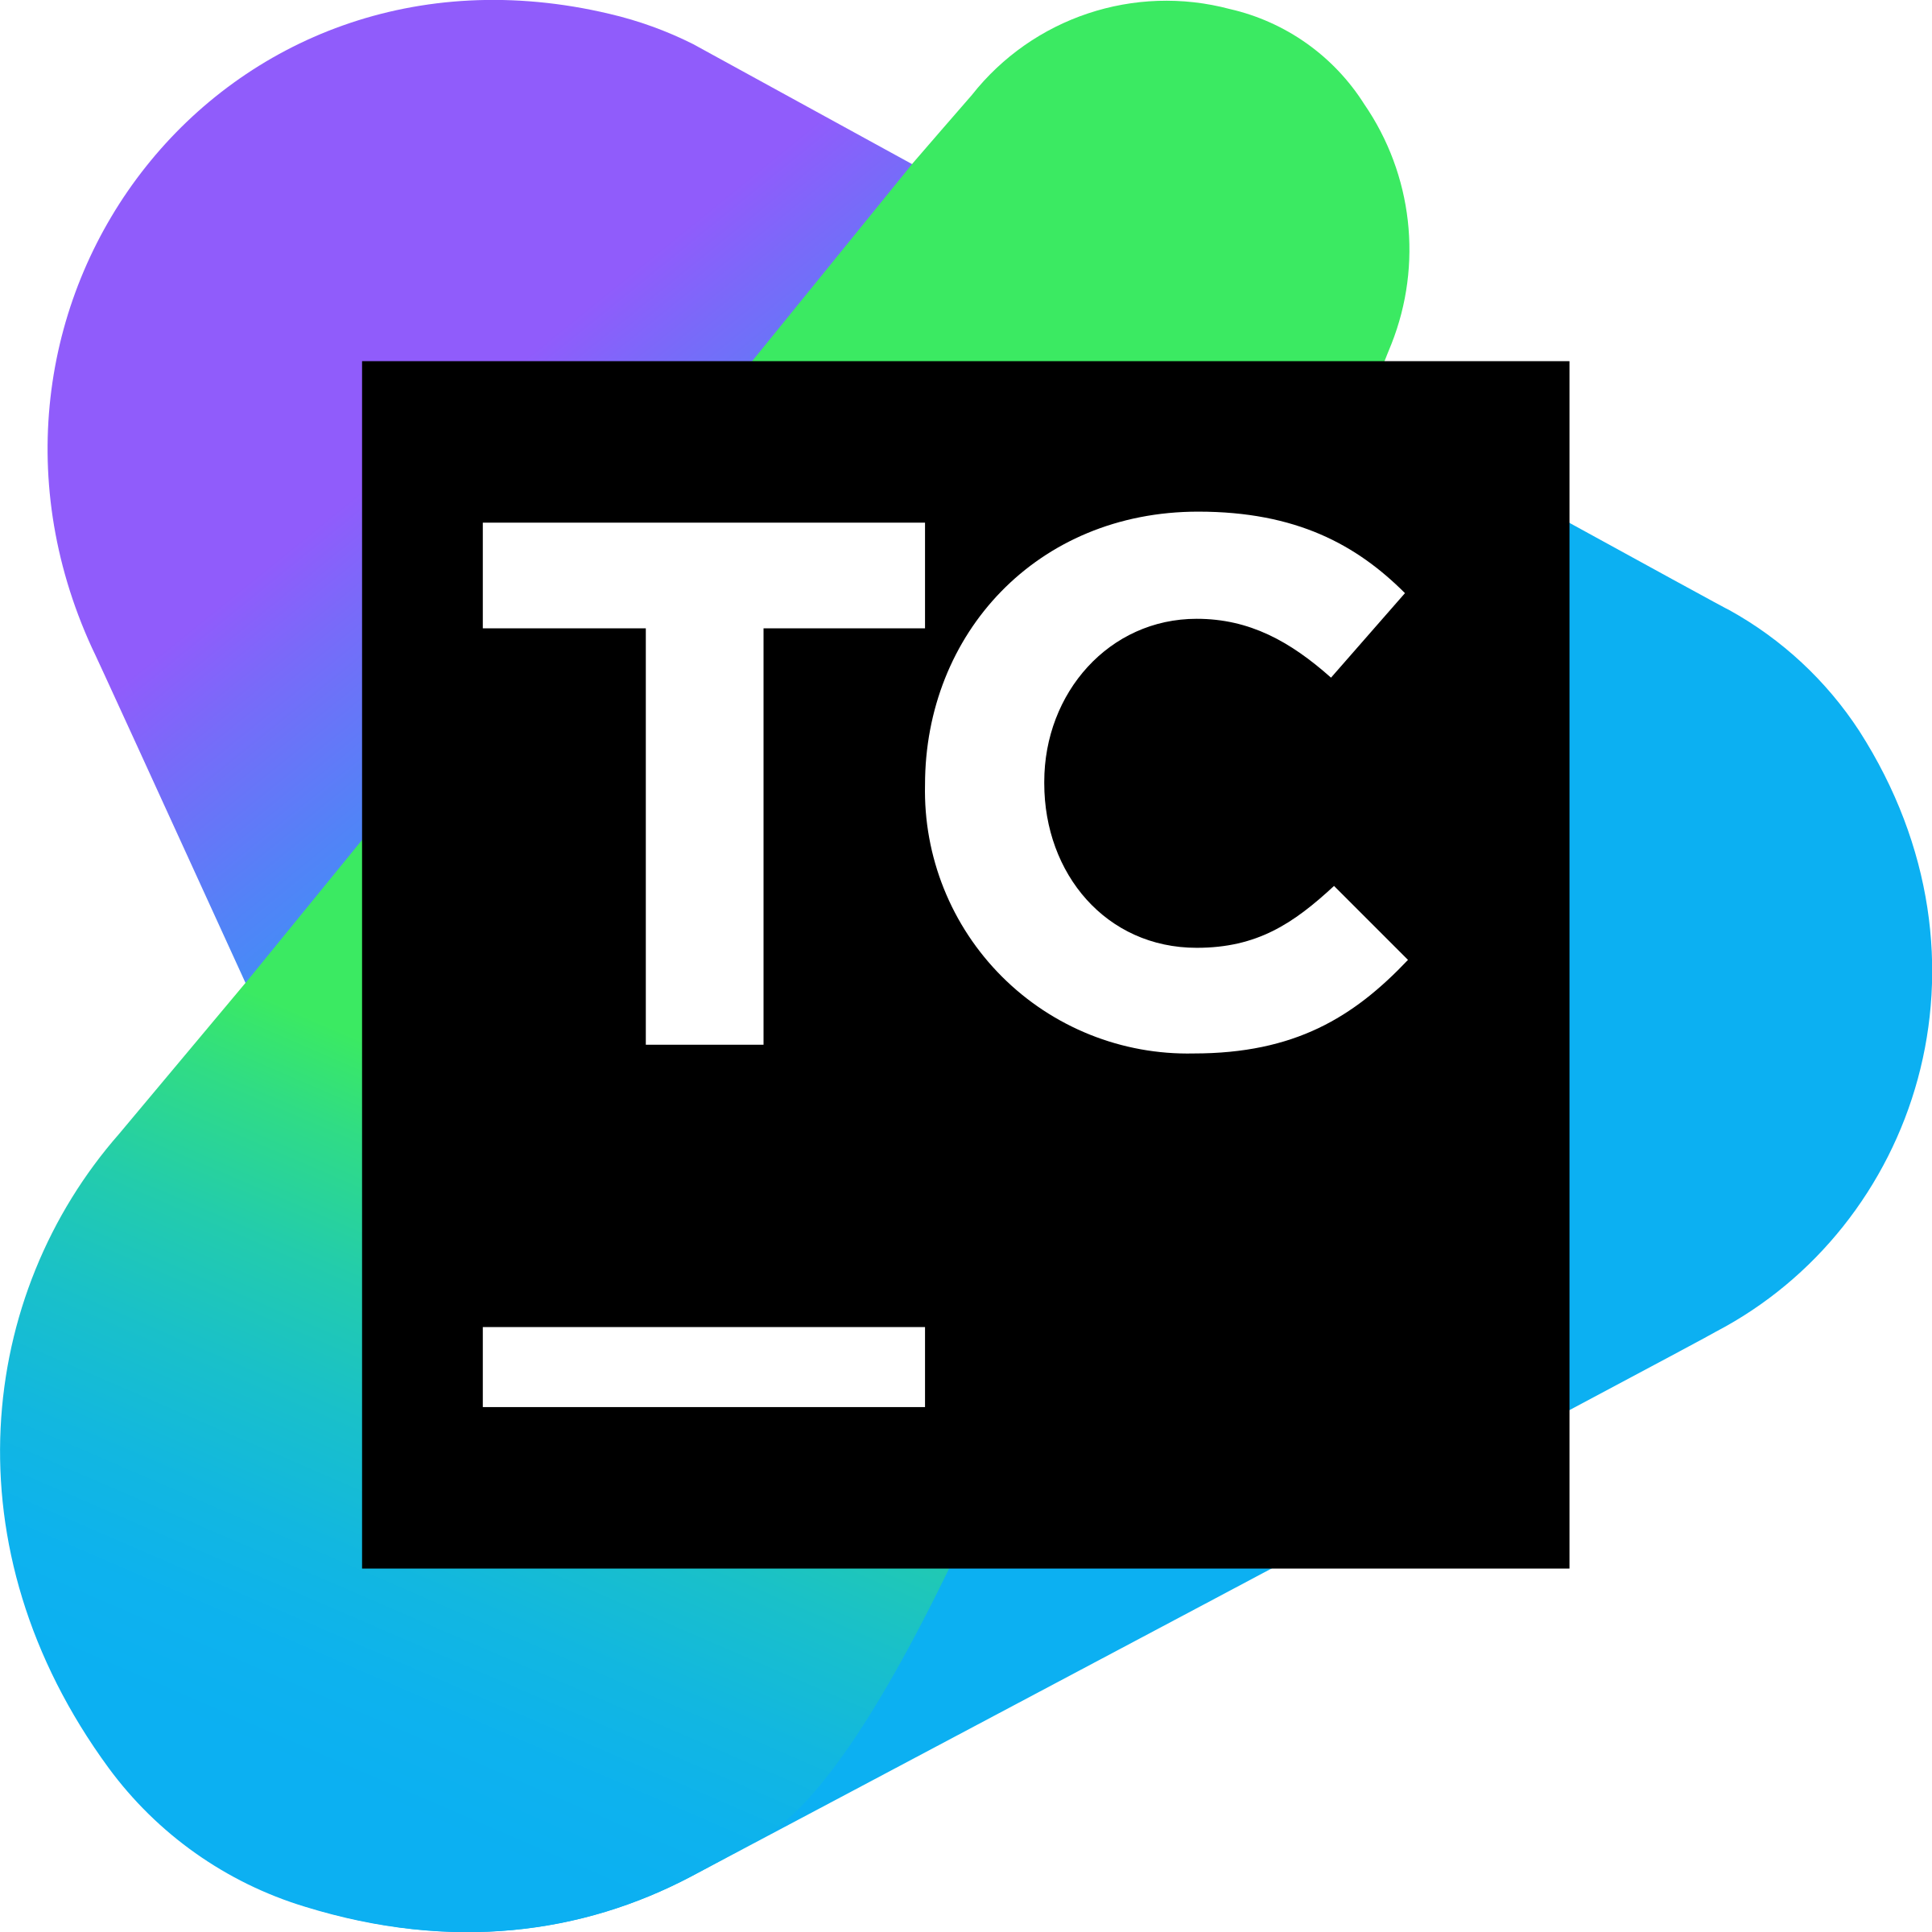 teamcity icon logo png transparent amp svg vector freebie